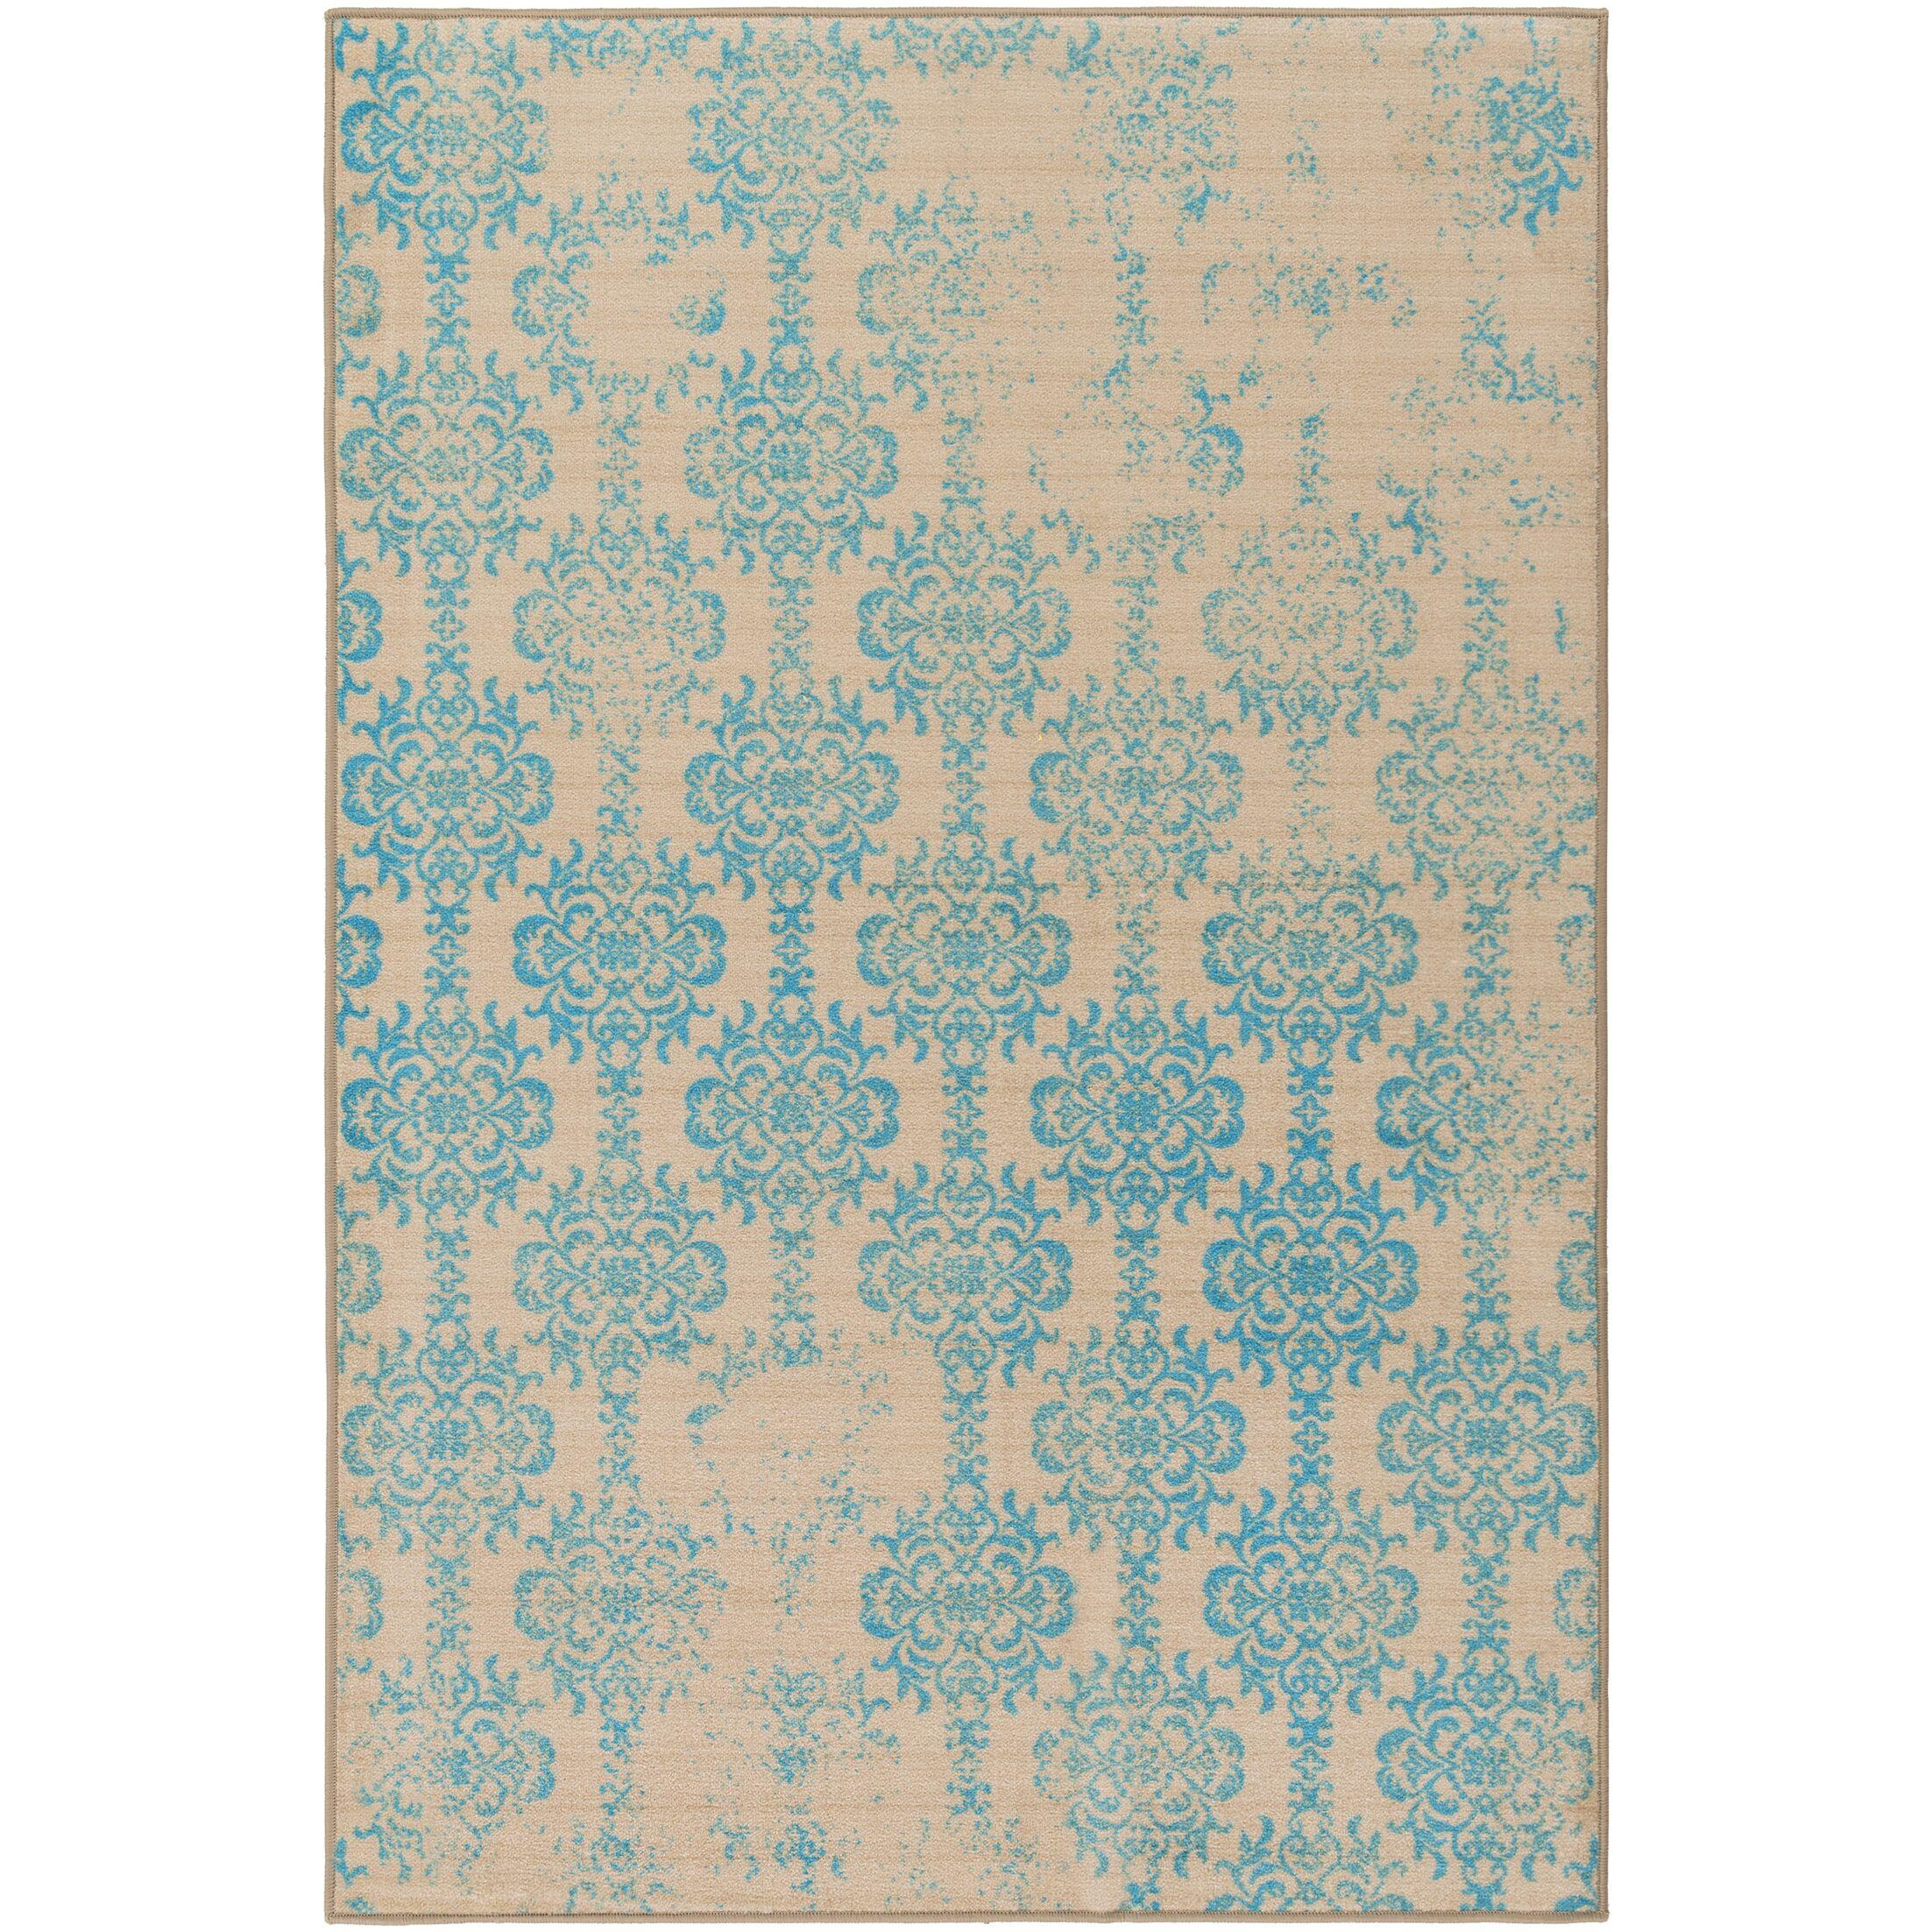 Cassie Beige/Blue Area Rug Rug Size: Rectangle 8' x 10'